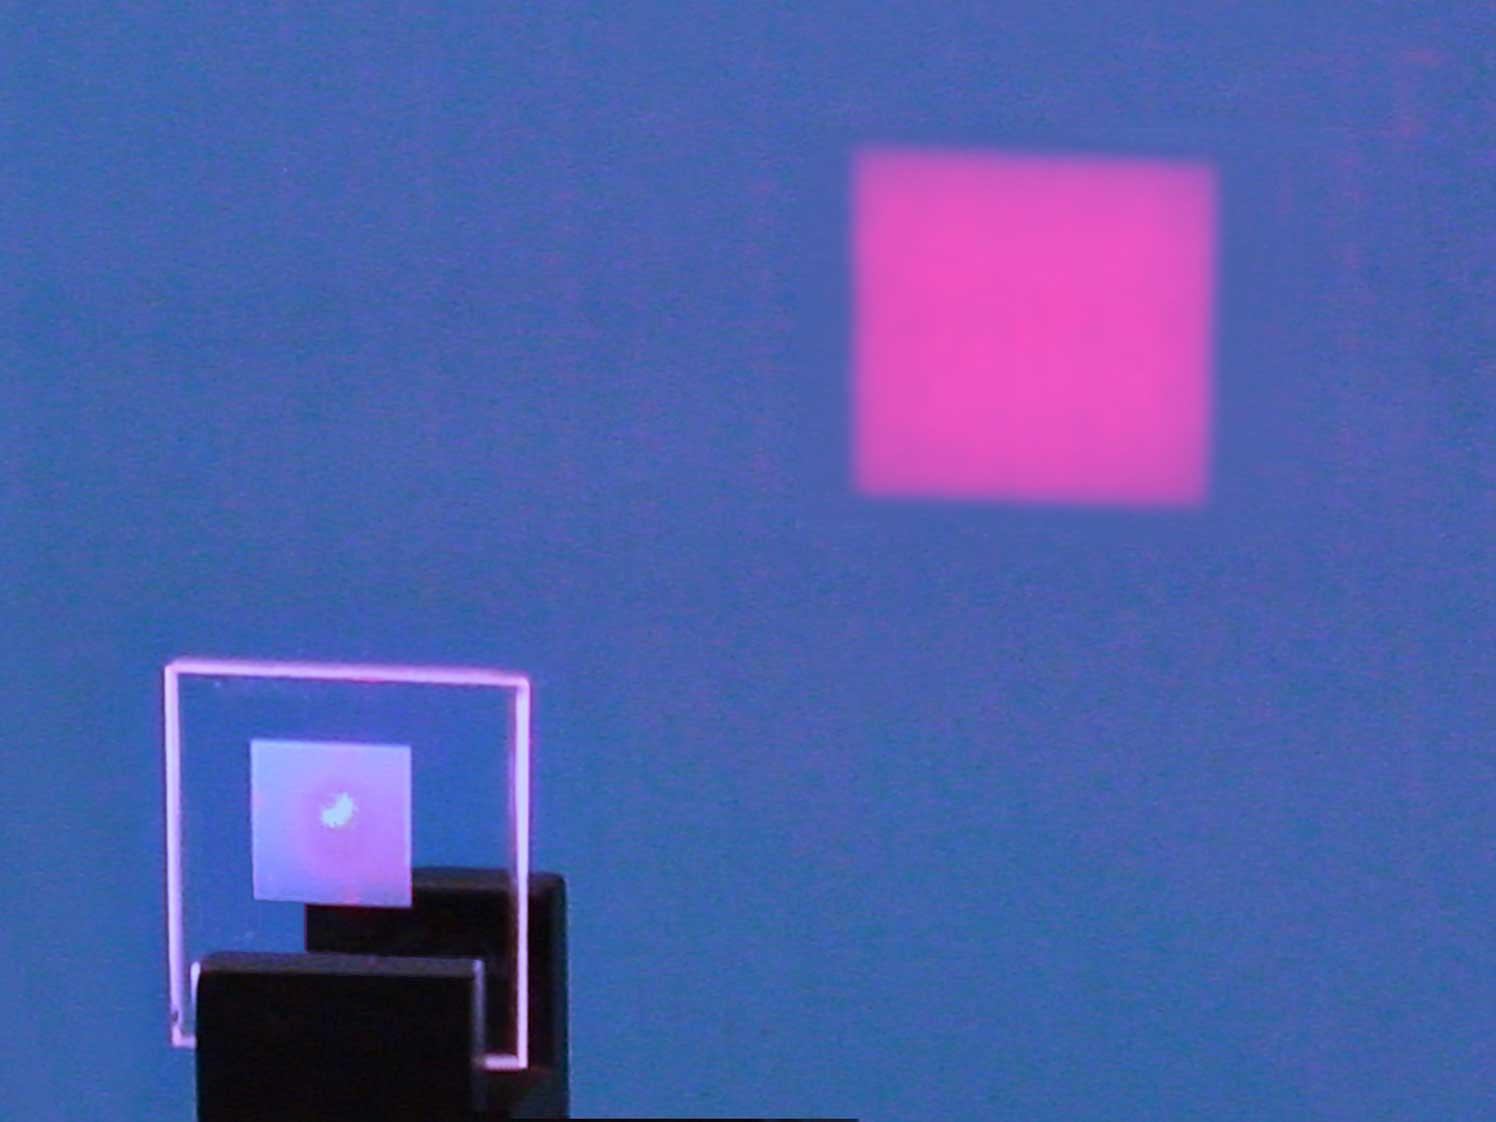 diffractive optical elements does jenoptik